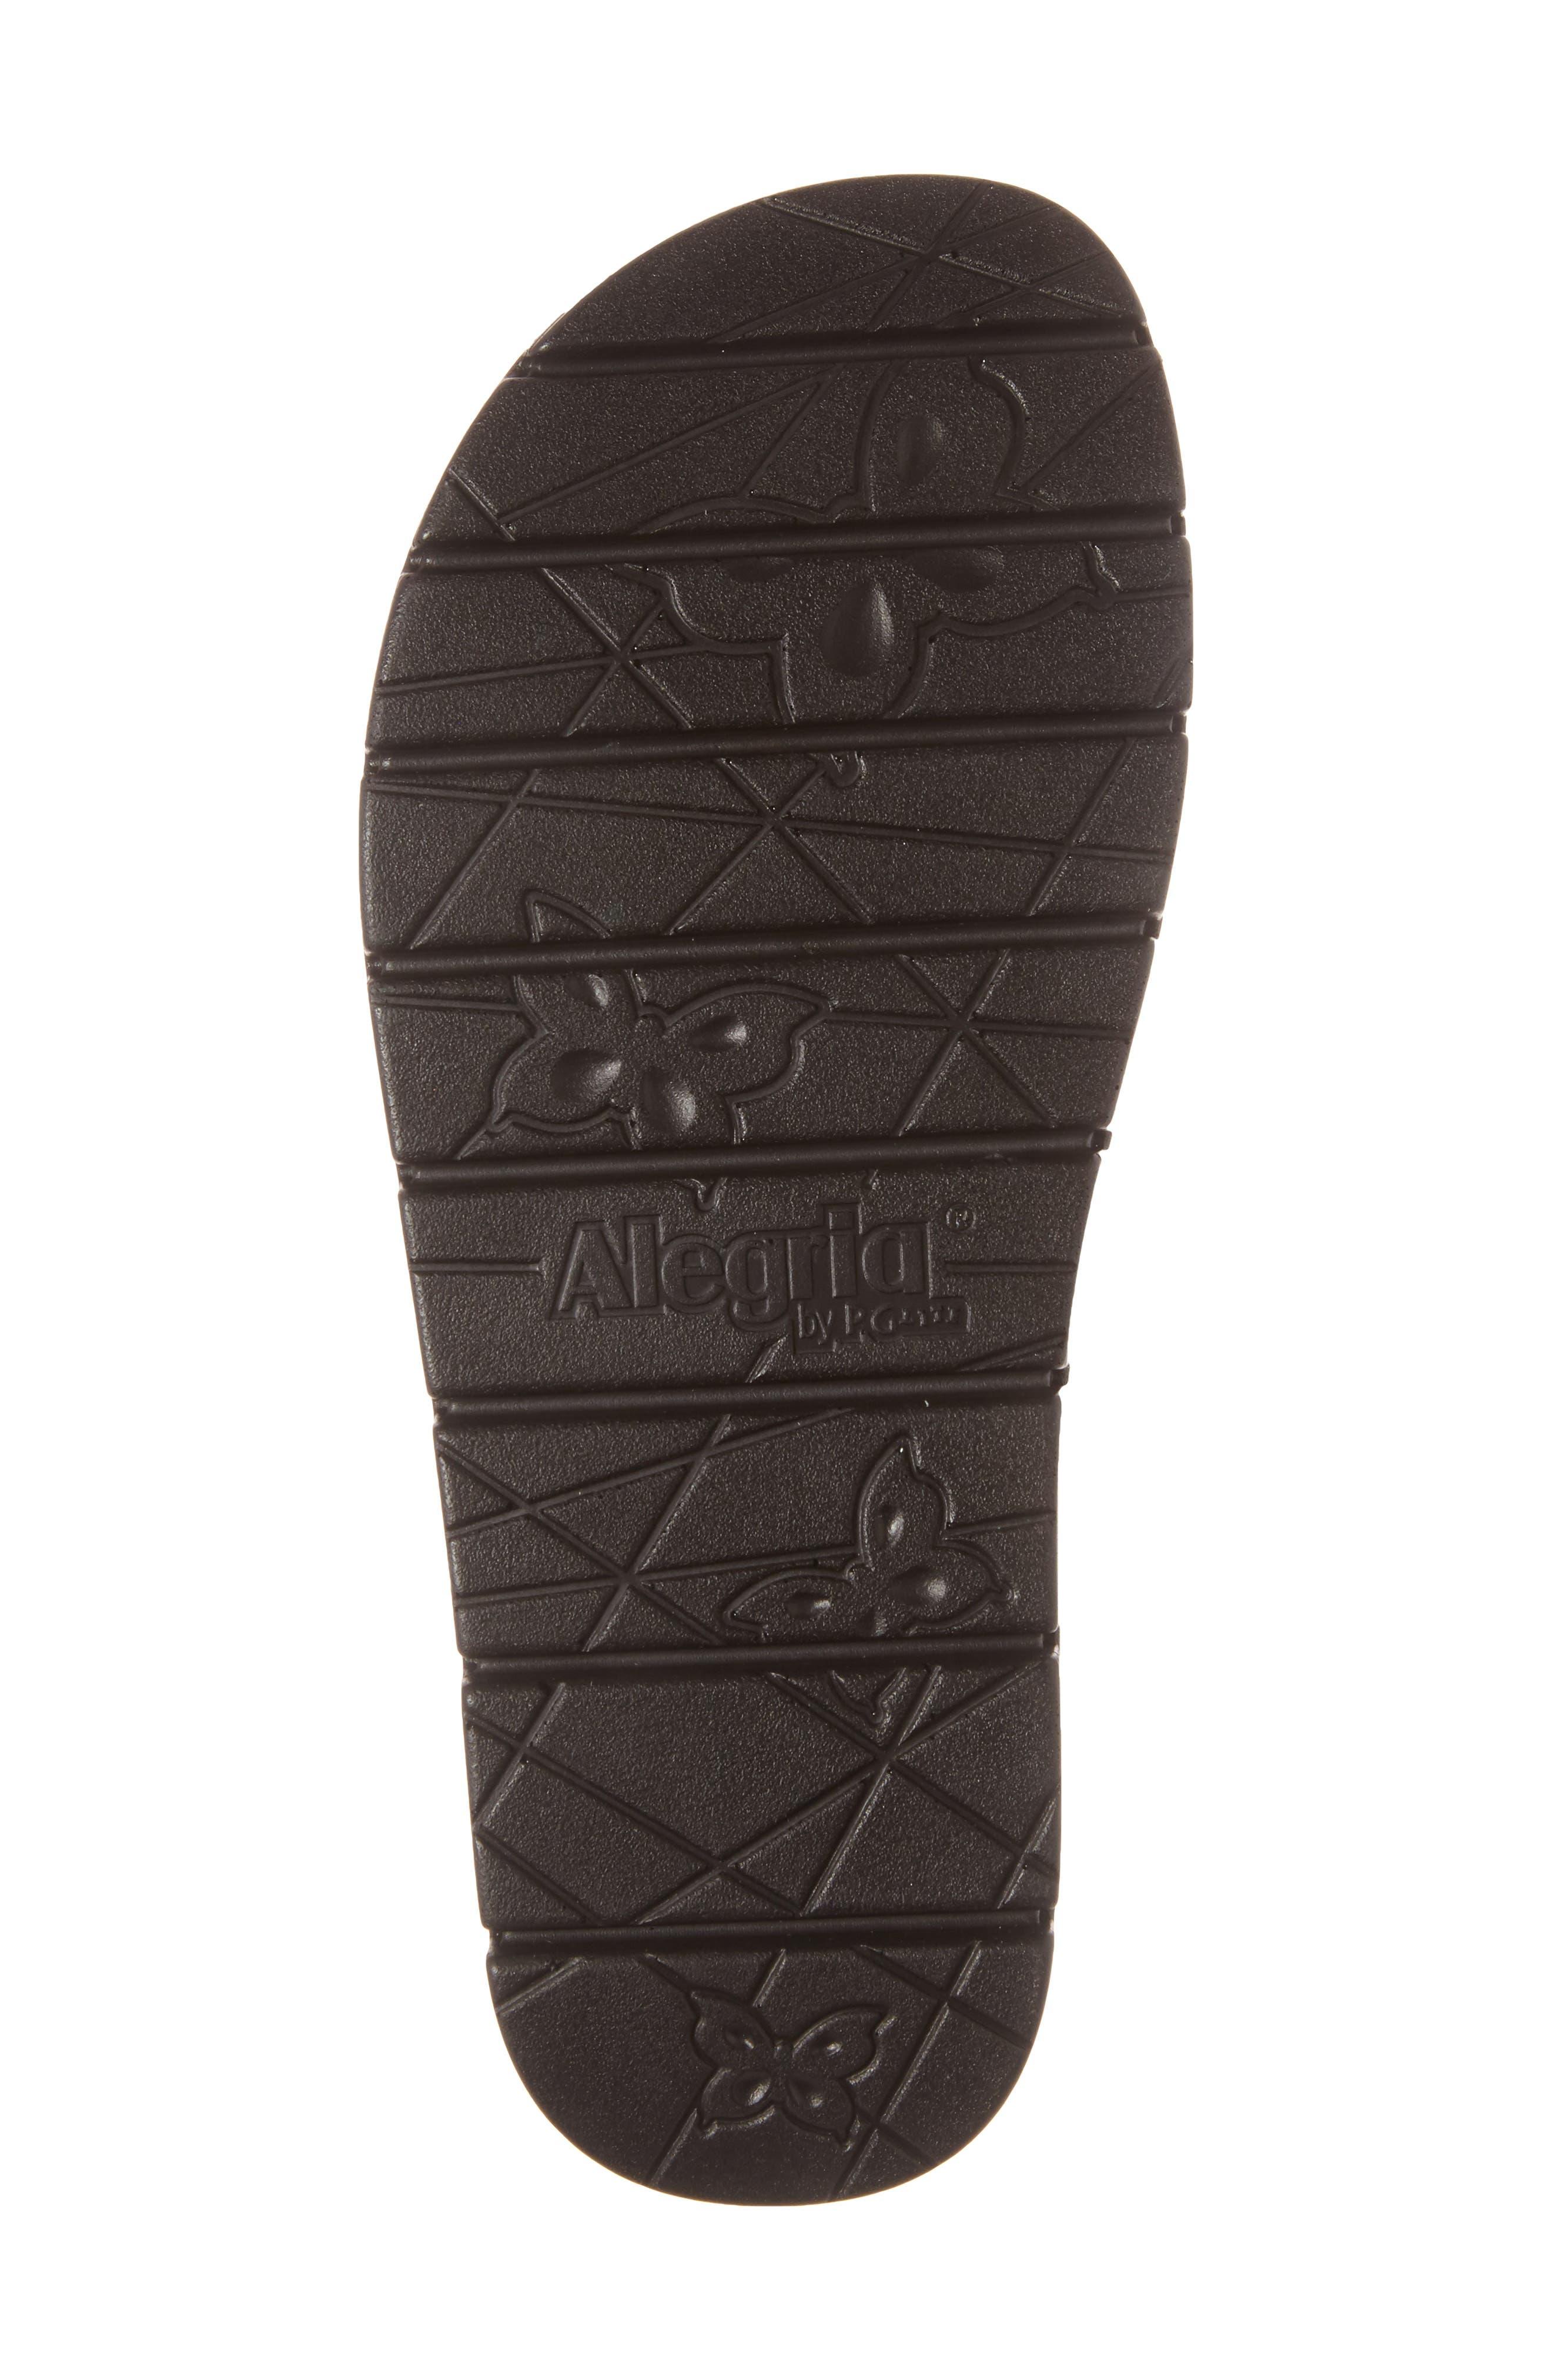 Playa Sandal,                             Alternate thumbnail 4, color,                             Pewter Patent Leather